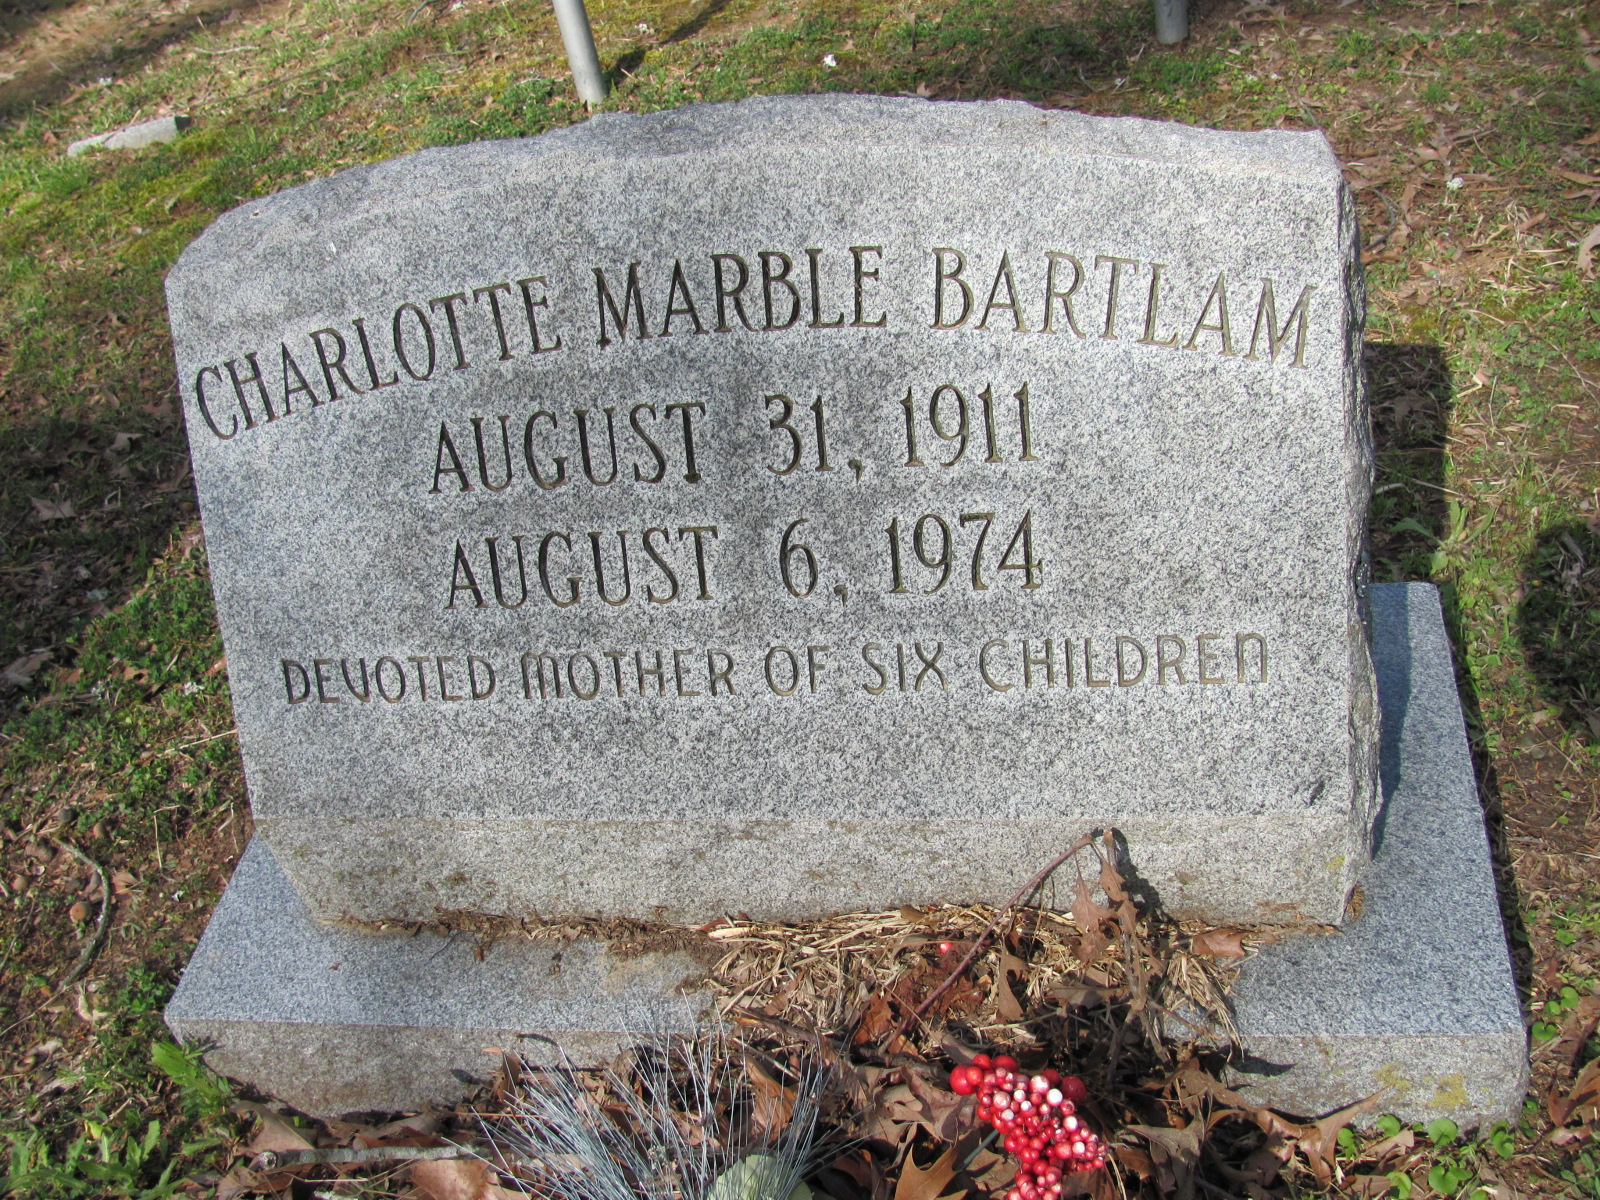 Charlotte <i>Marble</i> Bartlam